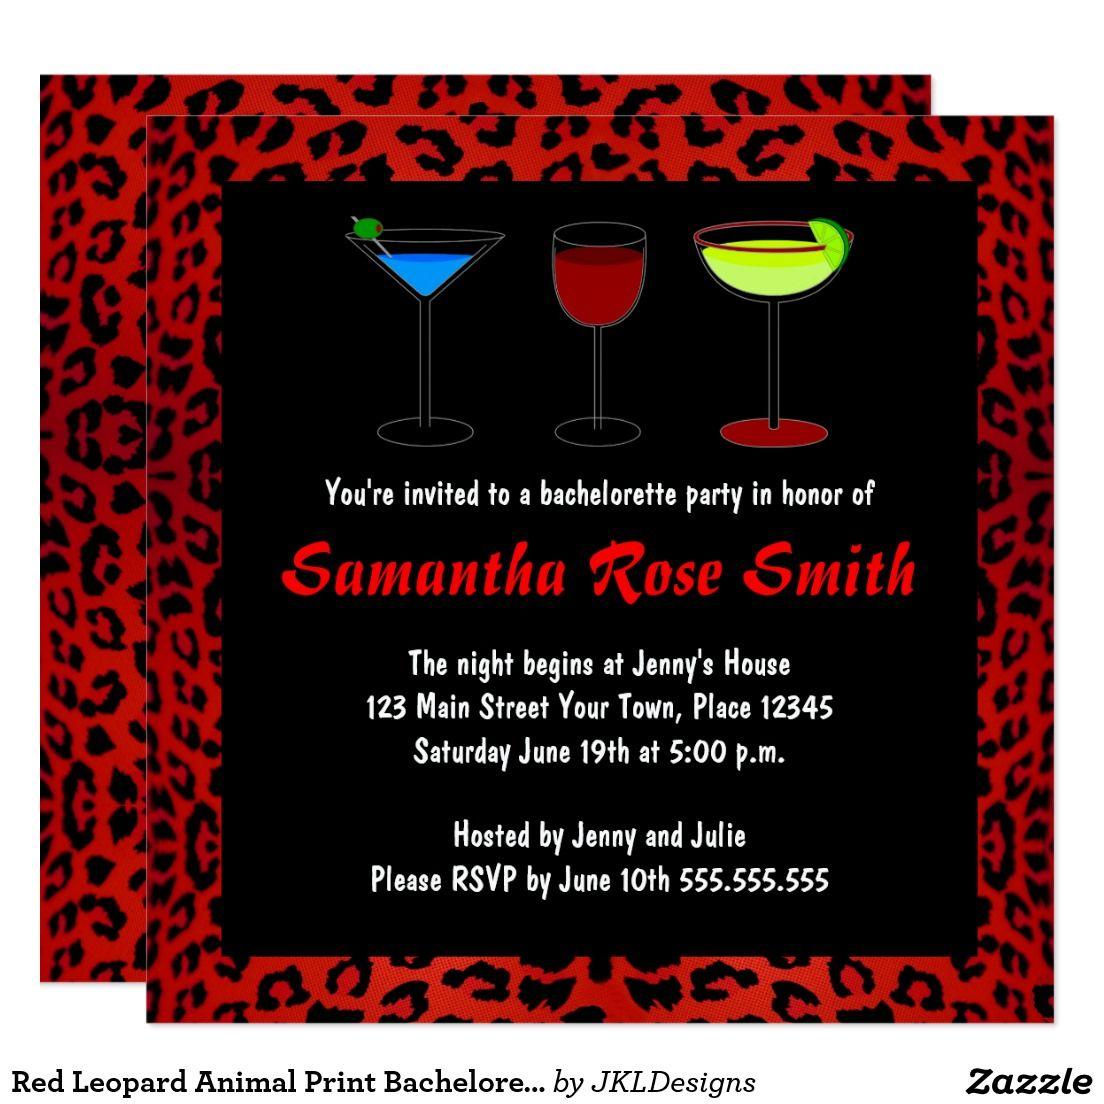 Red Leopard Animal Print Bachelorette Party Invite | Pinterest ...